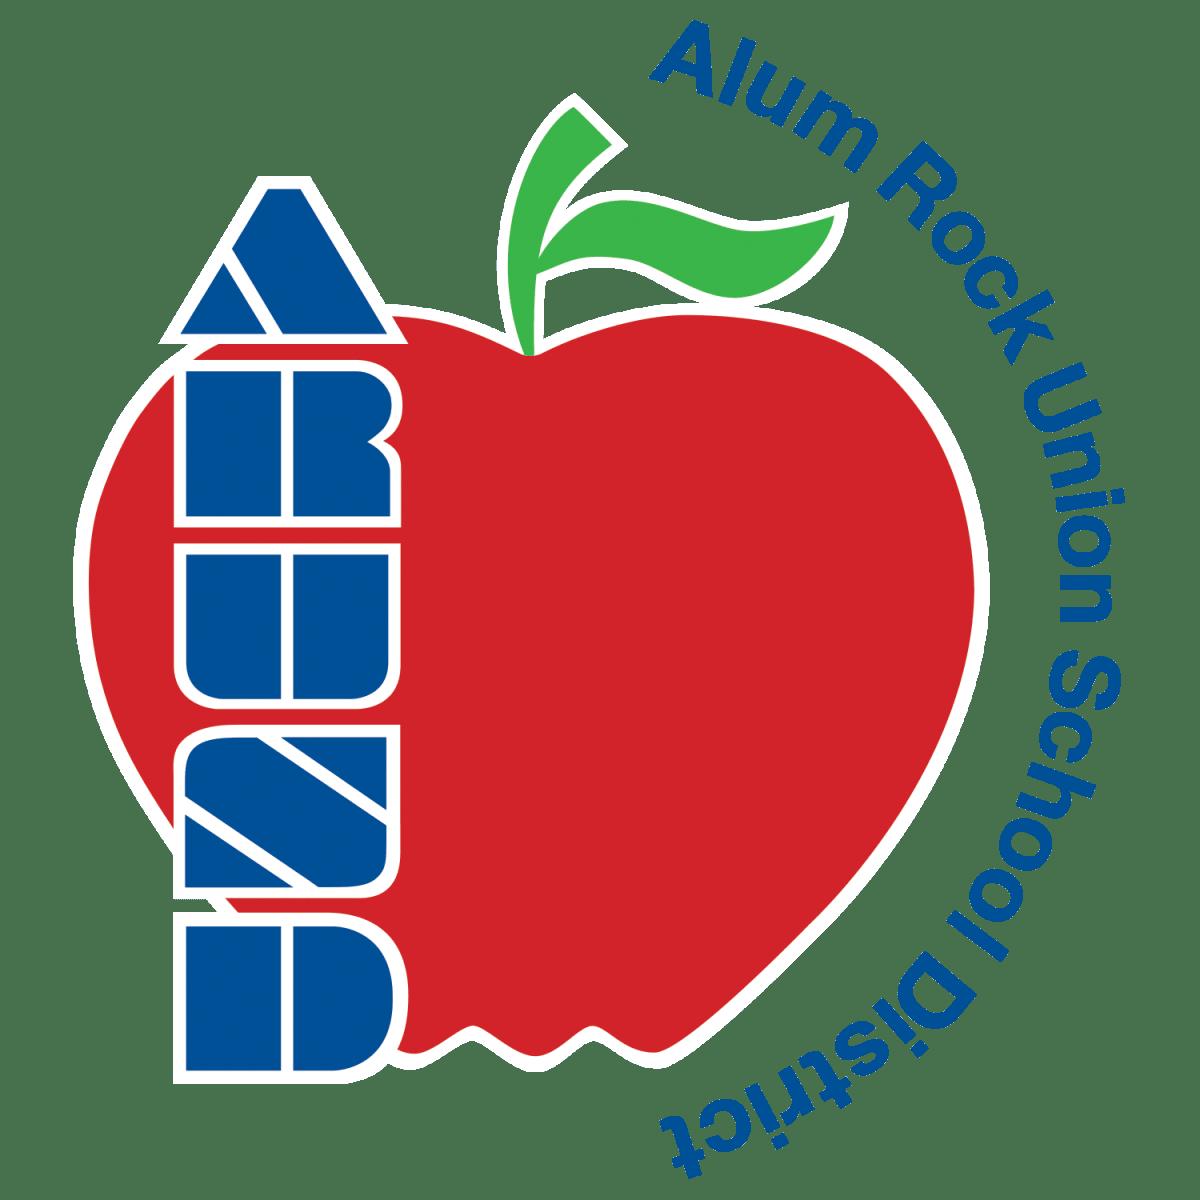 Alum Rock Union School District